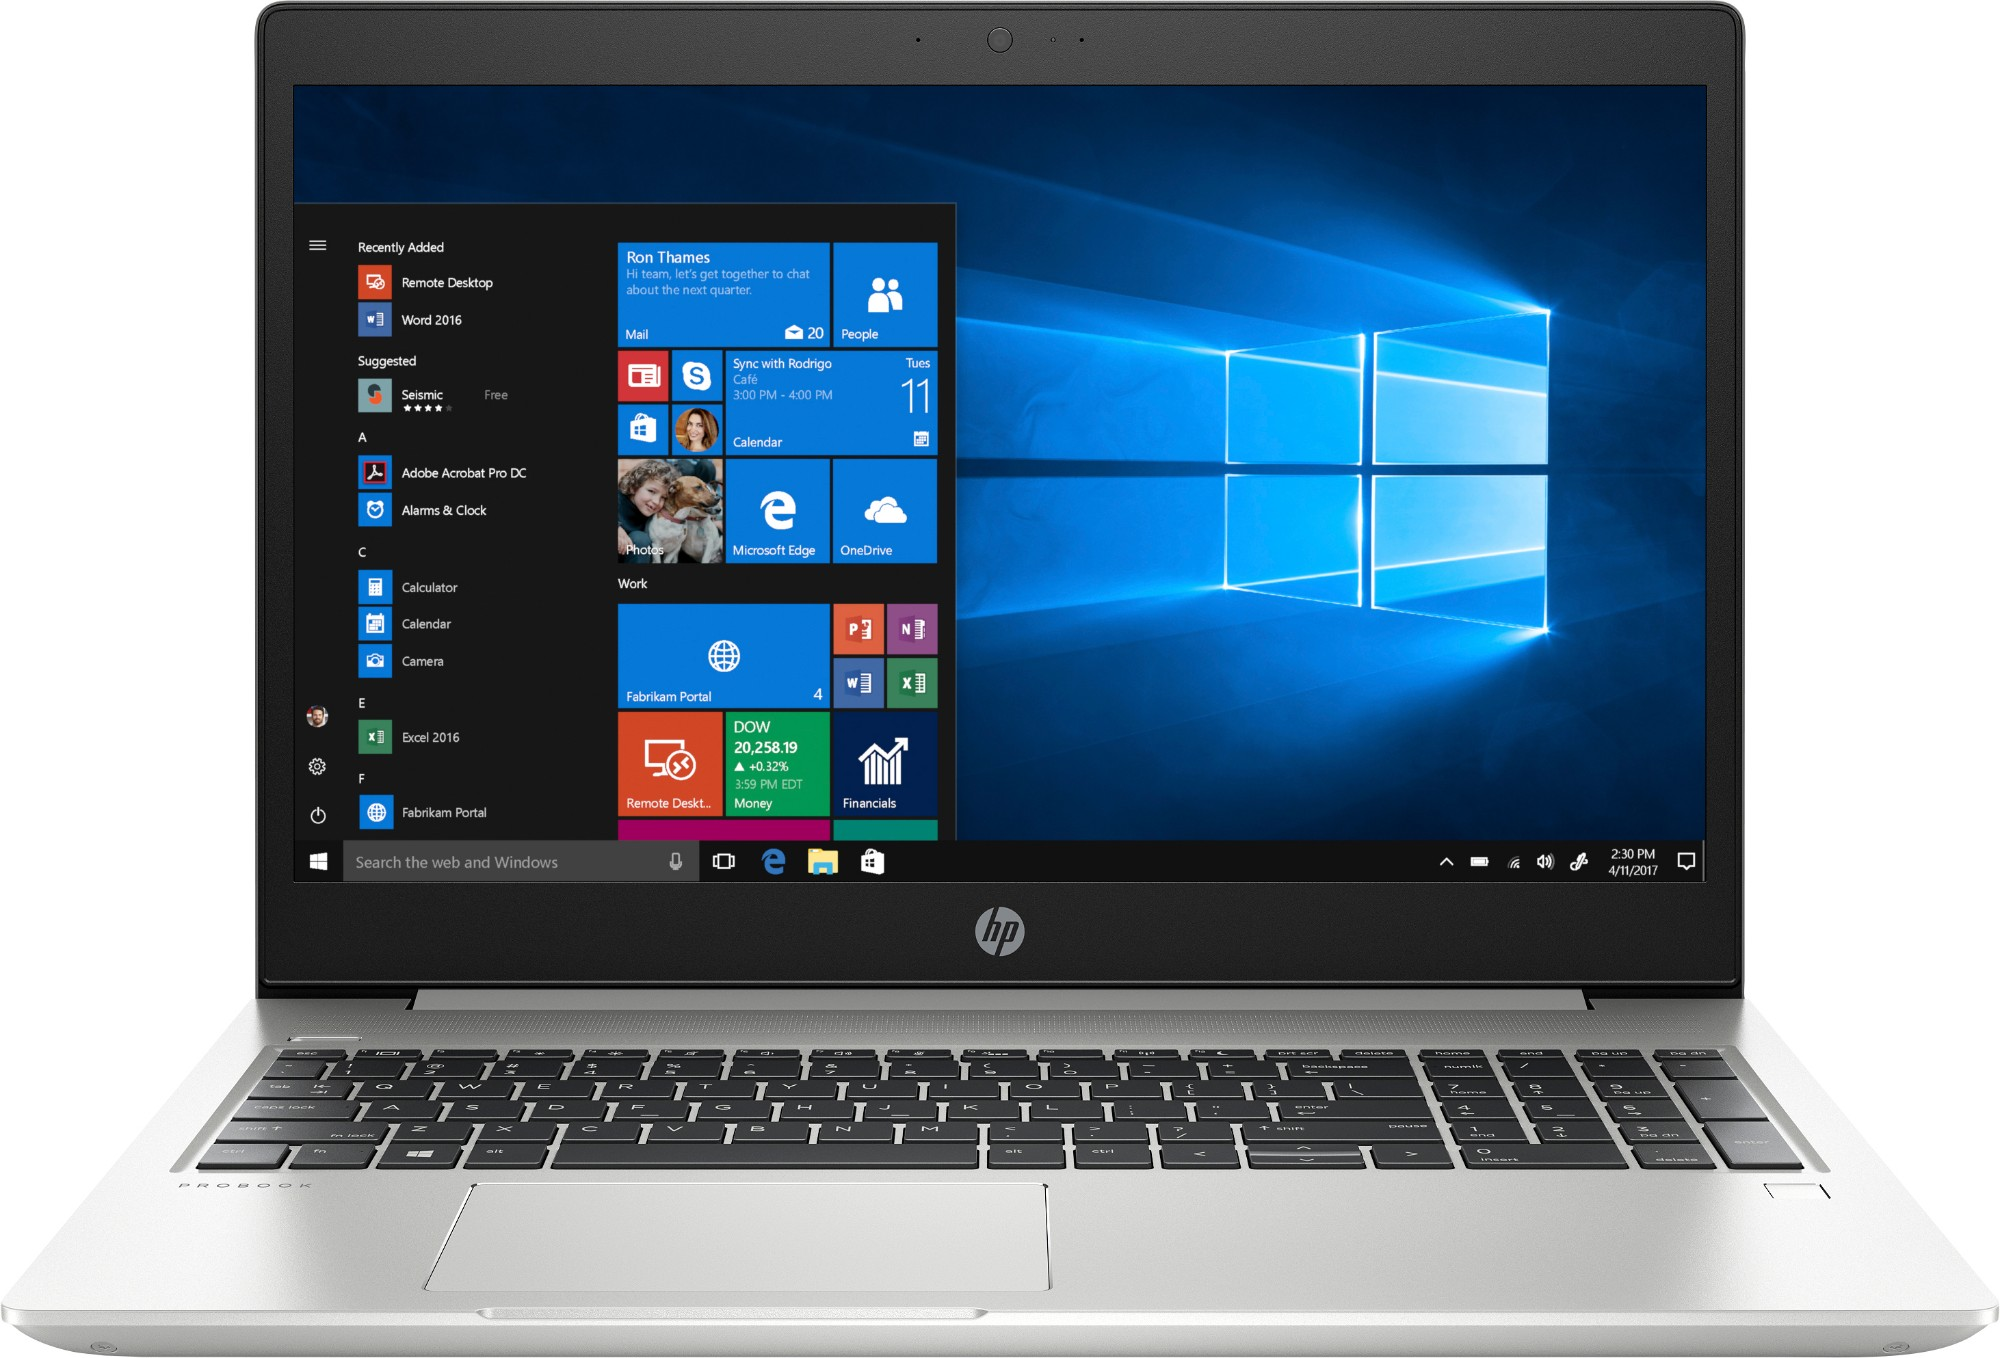 "HP ProBook 450 G6 Silver Notebook 39.6 cm (15.6"") 1366 x 768 pixels 8th gen Intel® Core™ i3 4 GB DDR4-SDRAM 256 GB SSD Windows 10 Pro"